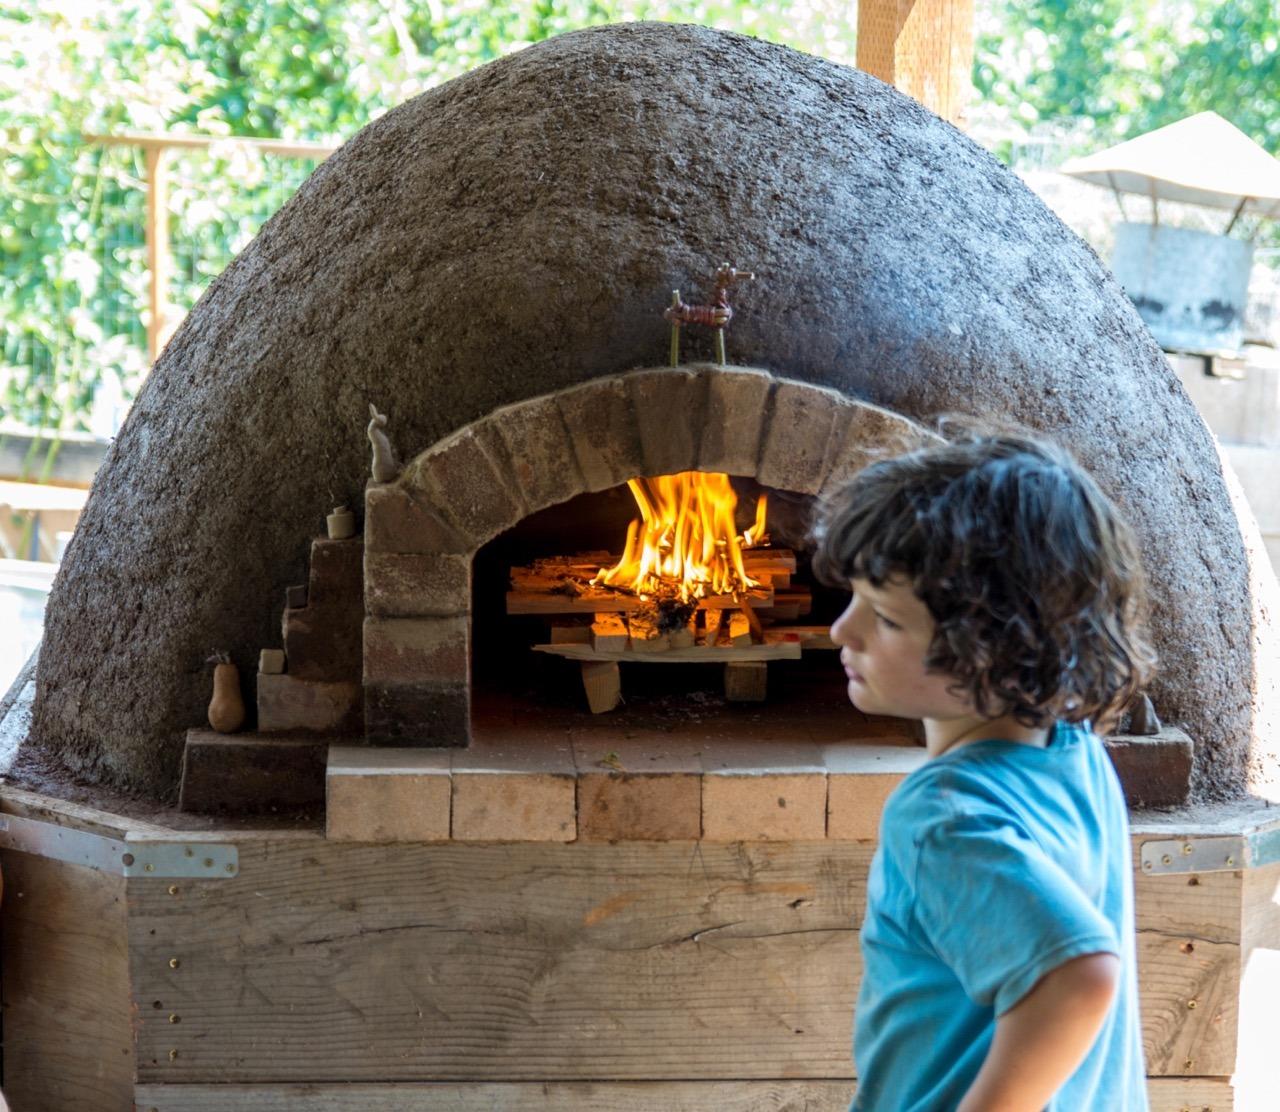 About Wood Fired Masonry Ovens